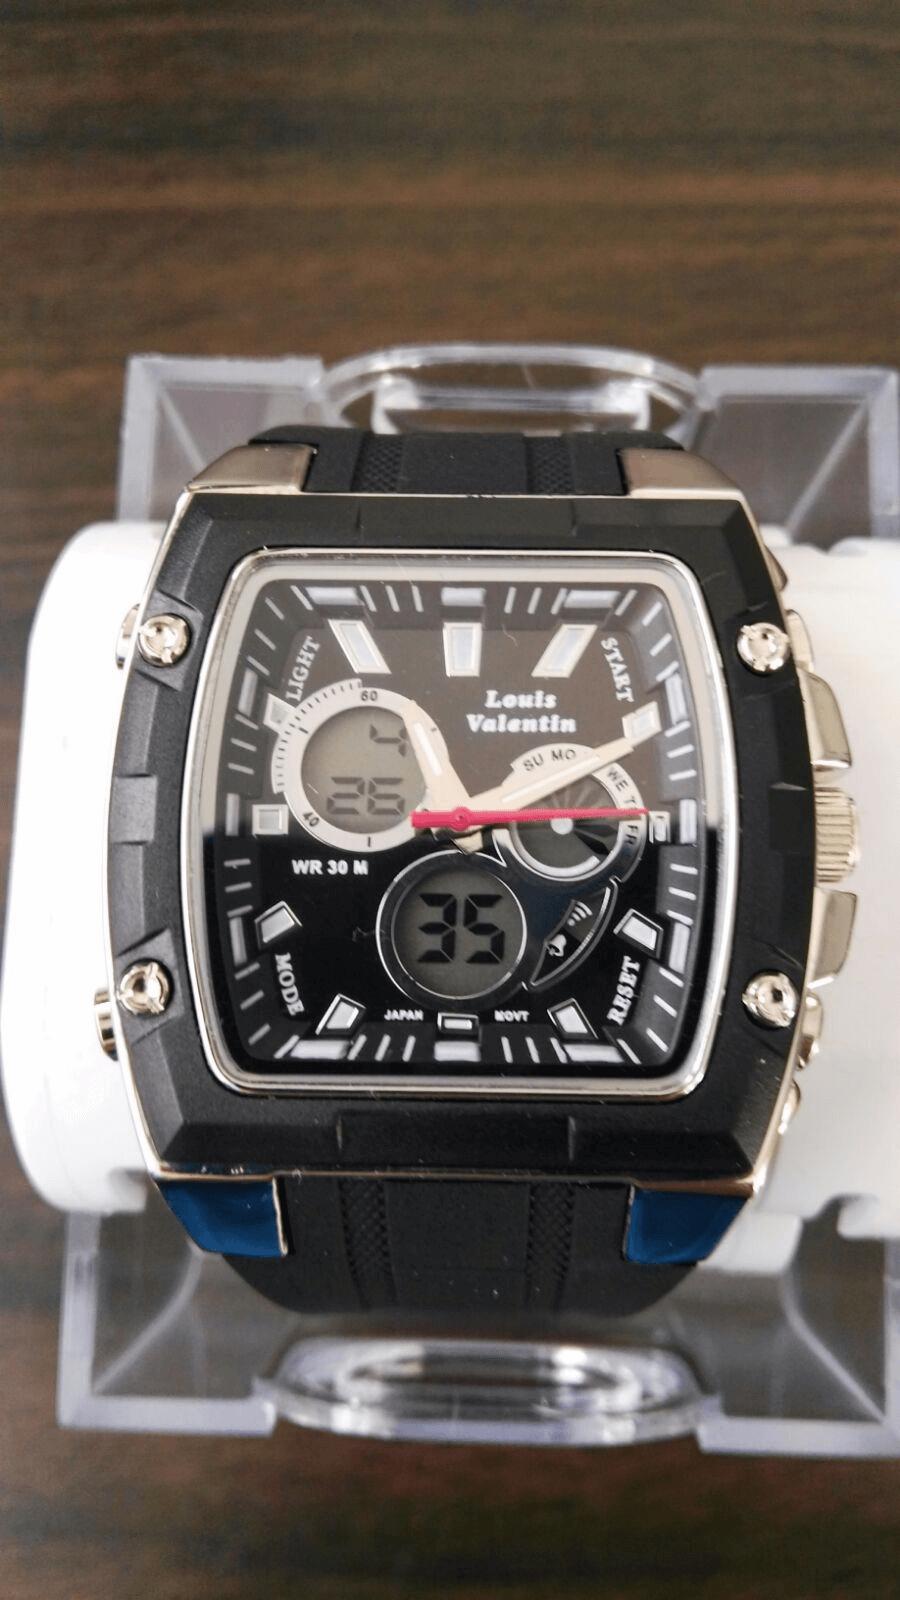 15a1533710e7 reloj cuadrado analogico y digital - RELOJILANDIA